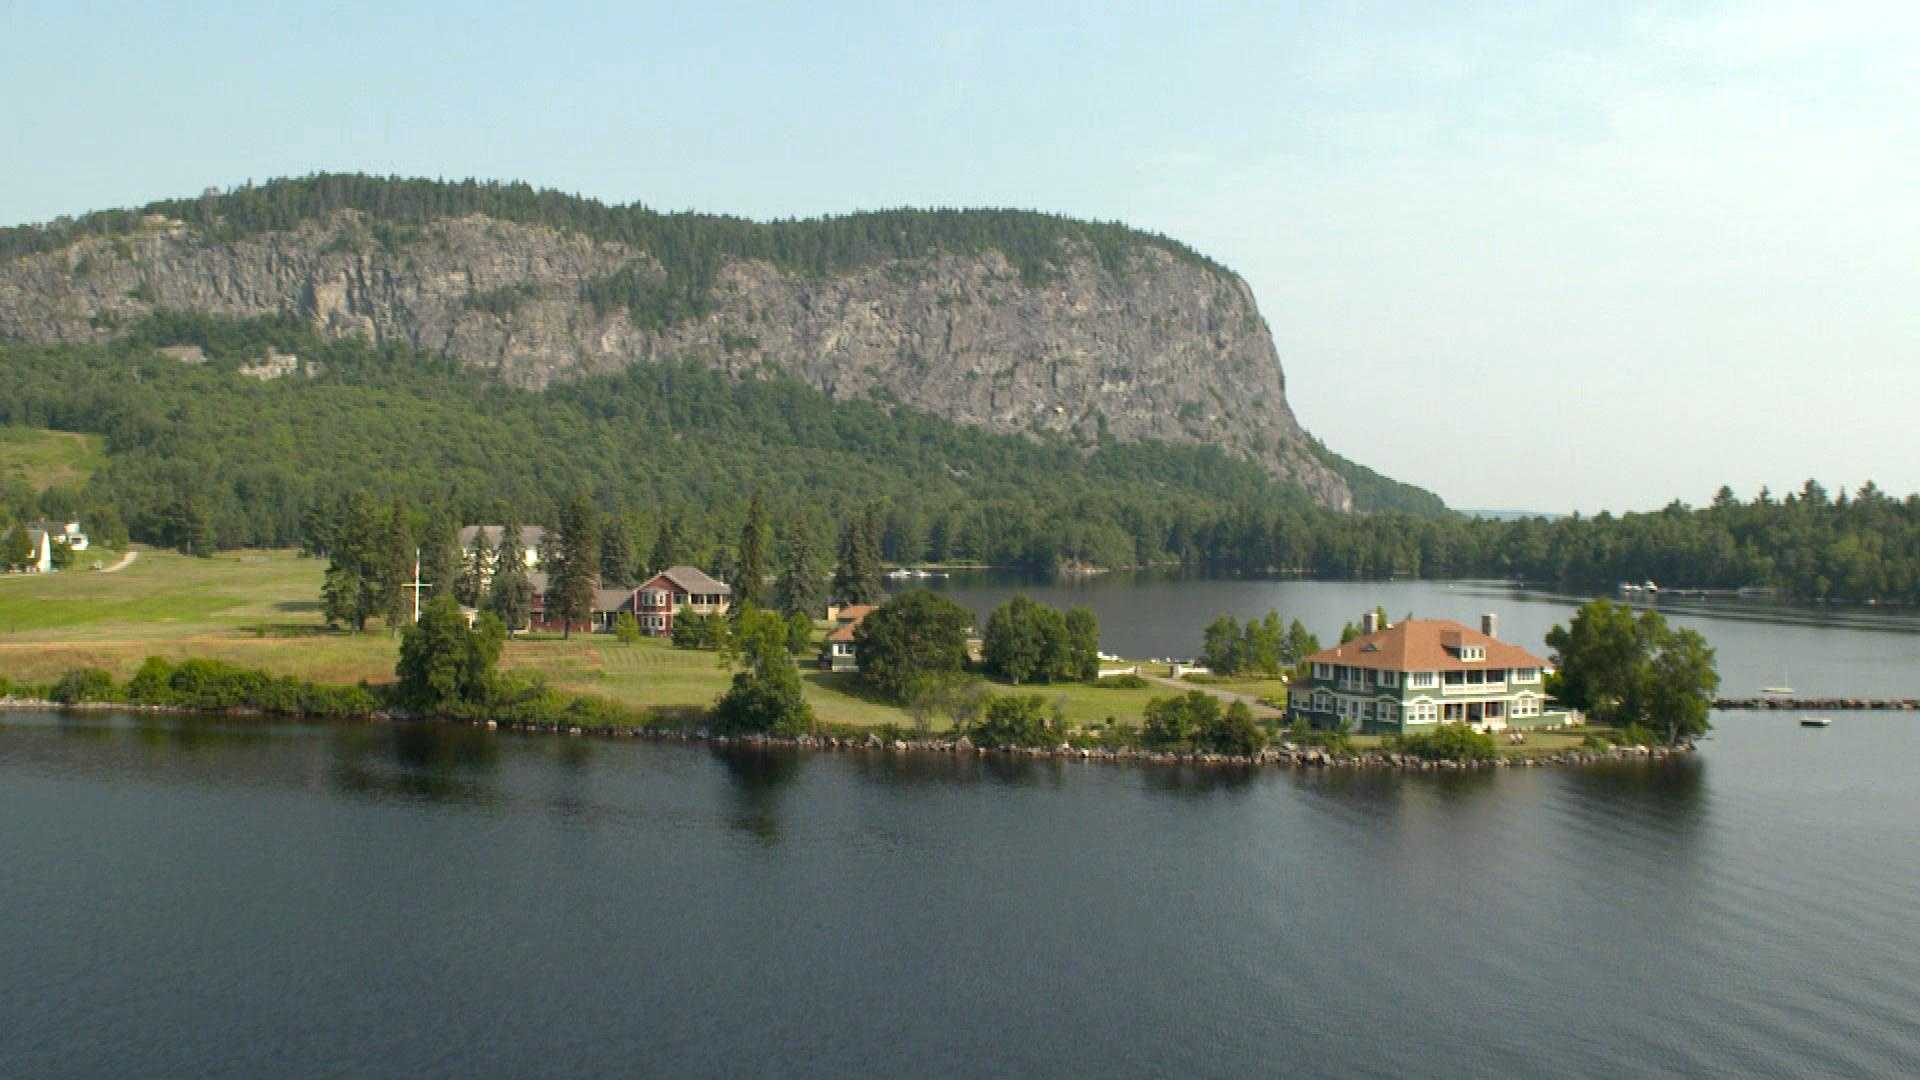 Monday, November 18: MSBR: Moosehead Lake, Maine